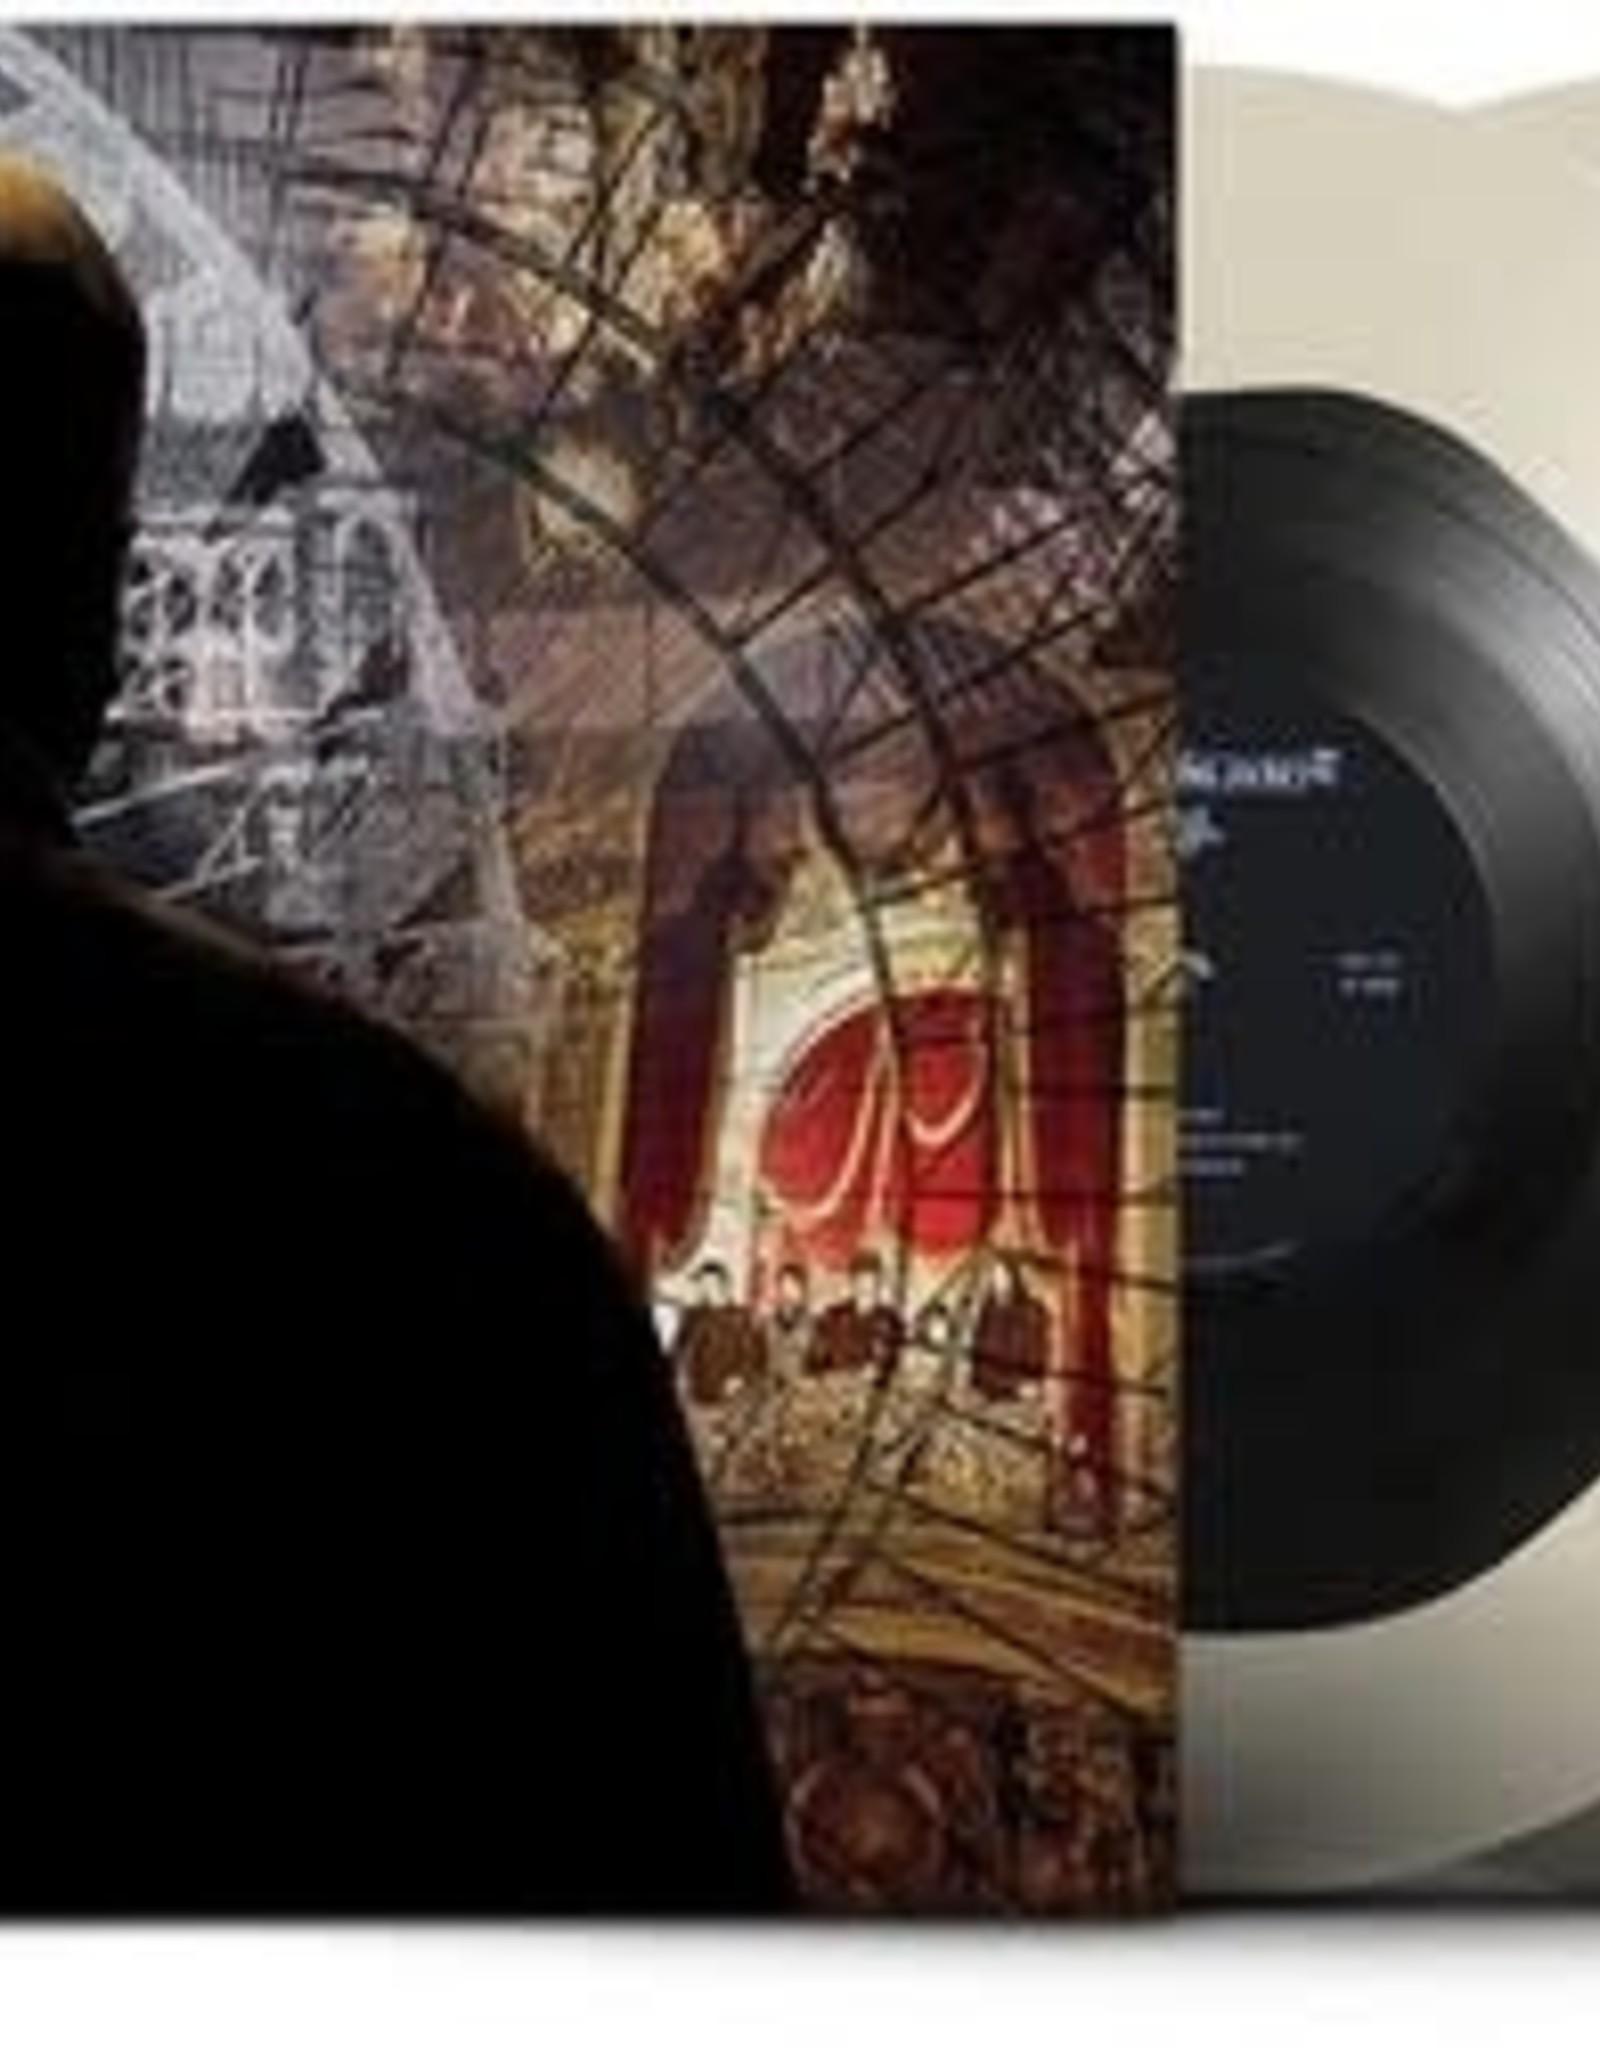 My Morning Jacket - Evil Urges [Cream/ Black Blob 2 LP]